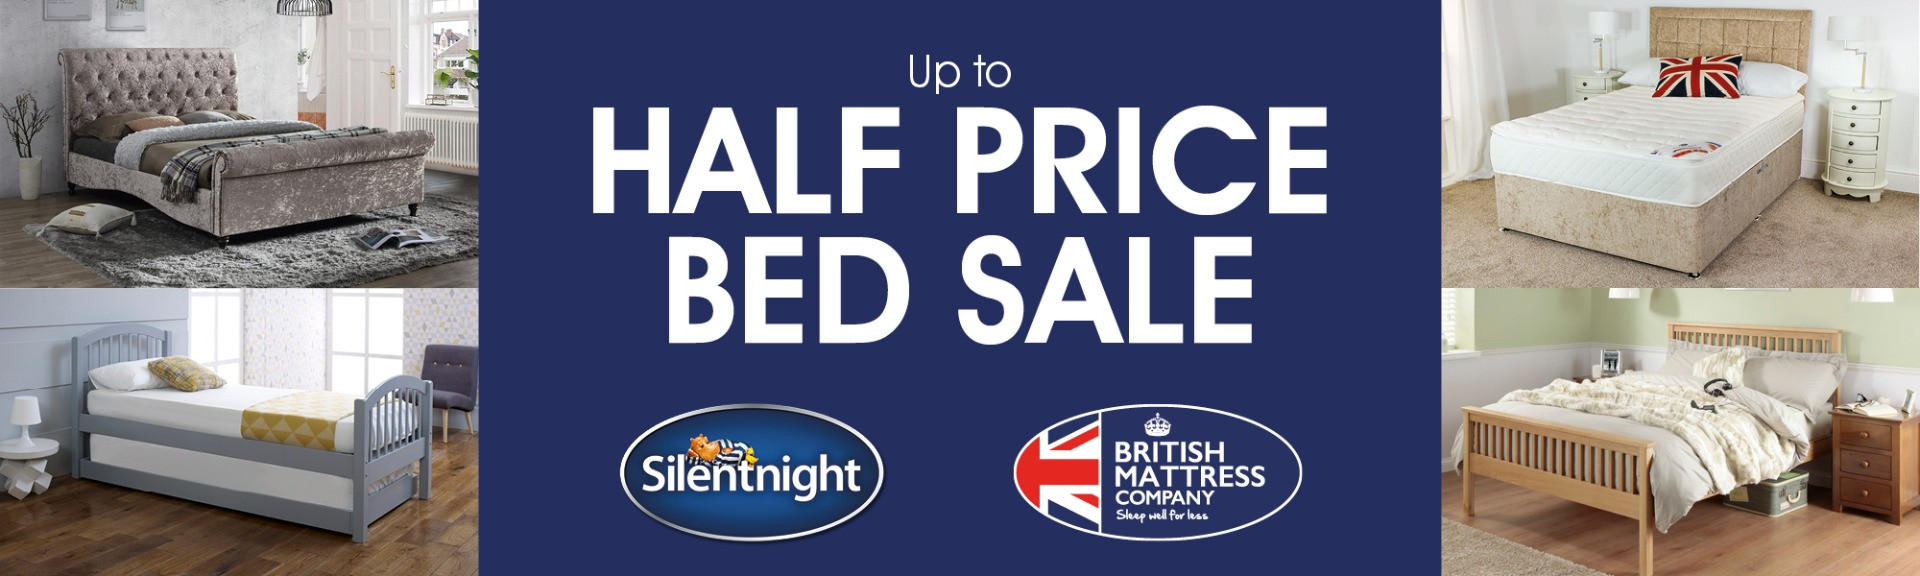 half price bed sale